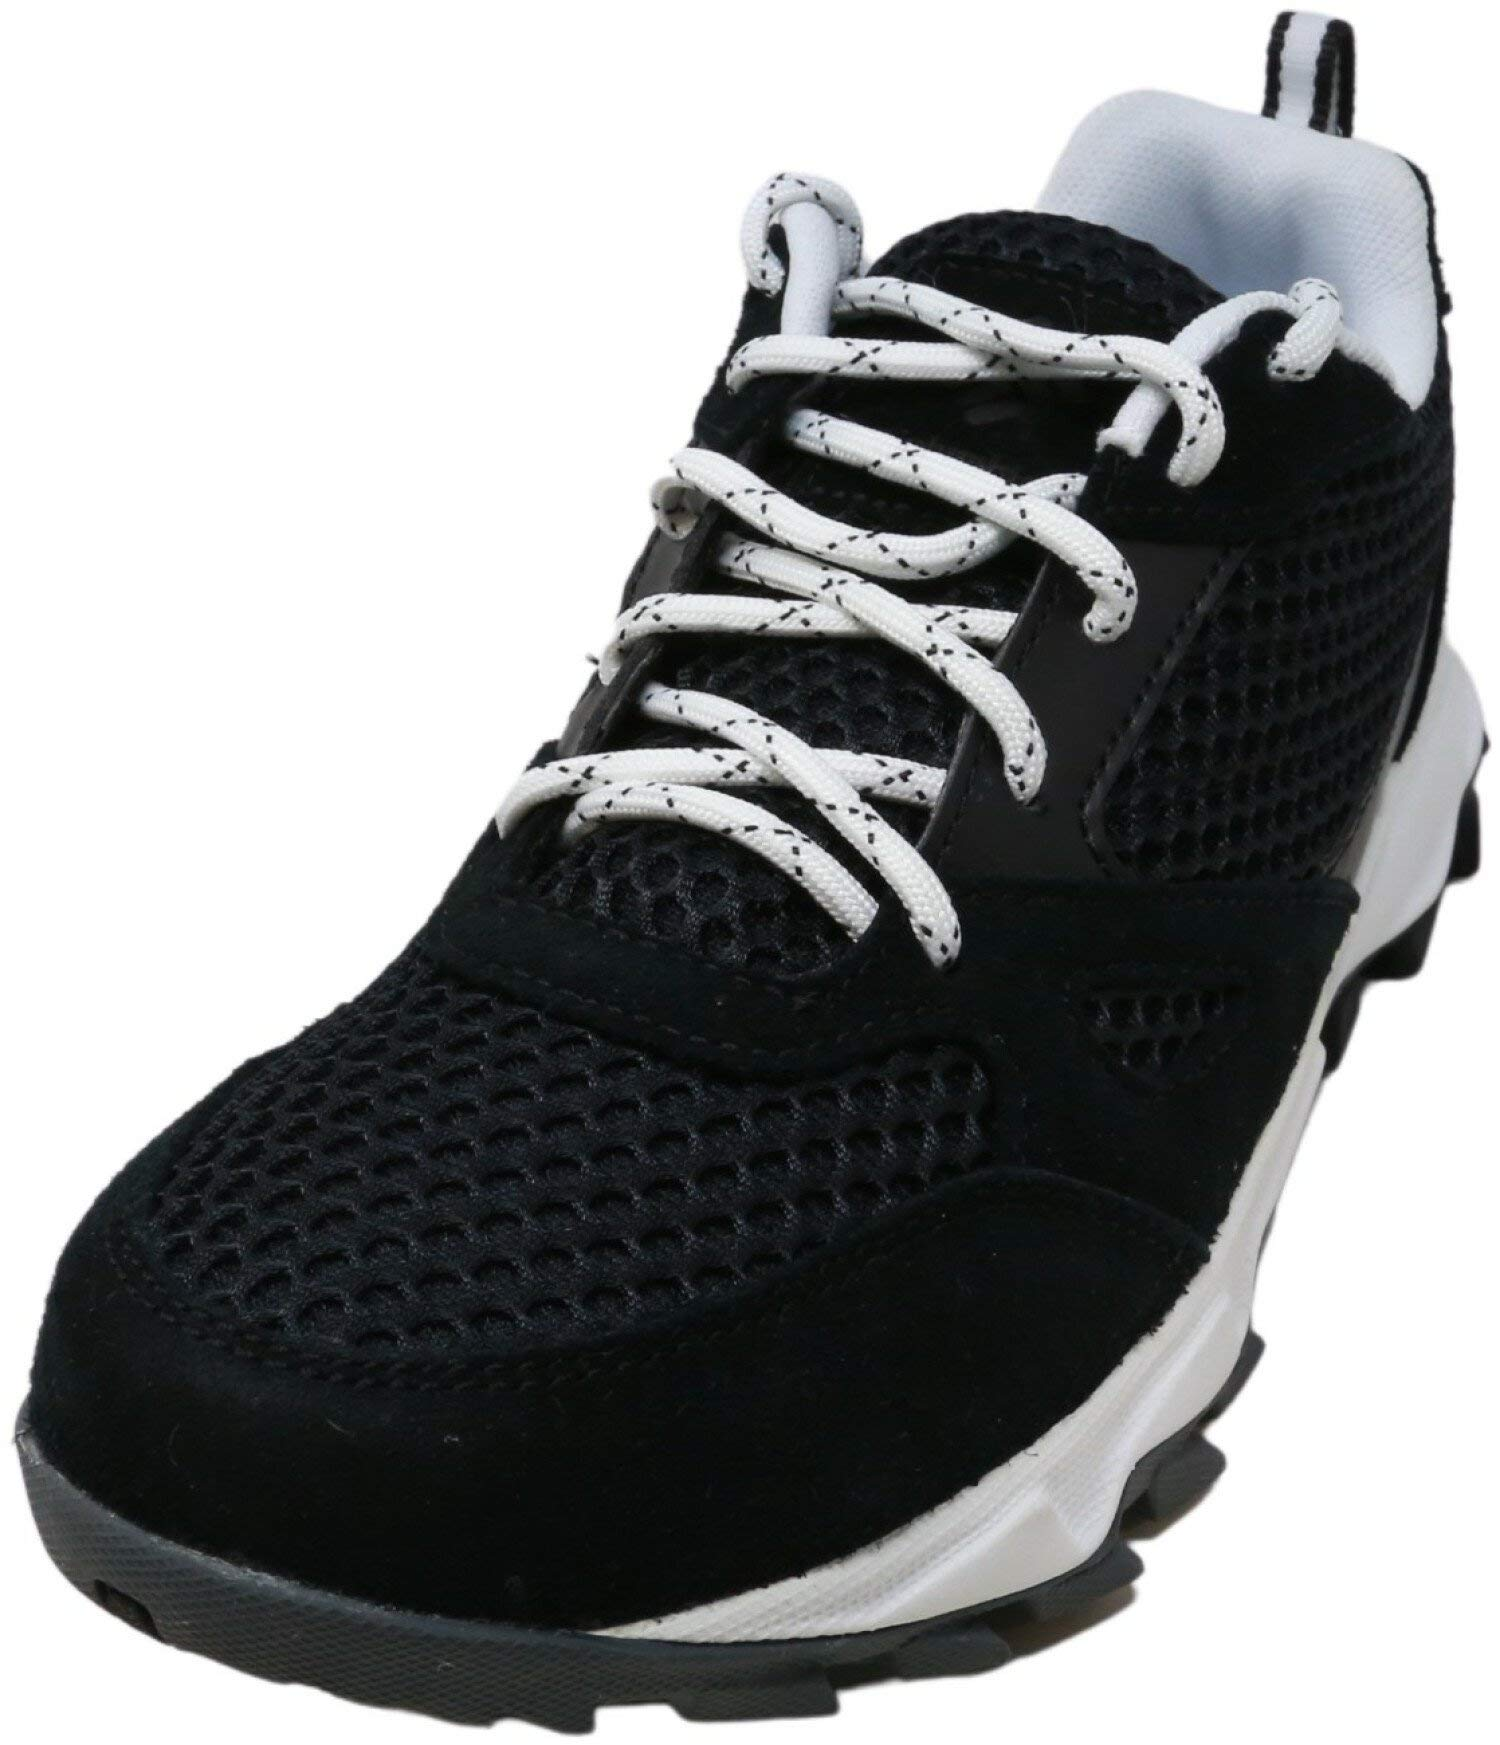 Columbia Damen IVO TRAIL BREEZE Sneaker, Schwarz, Weiß (Black, White), 4